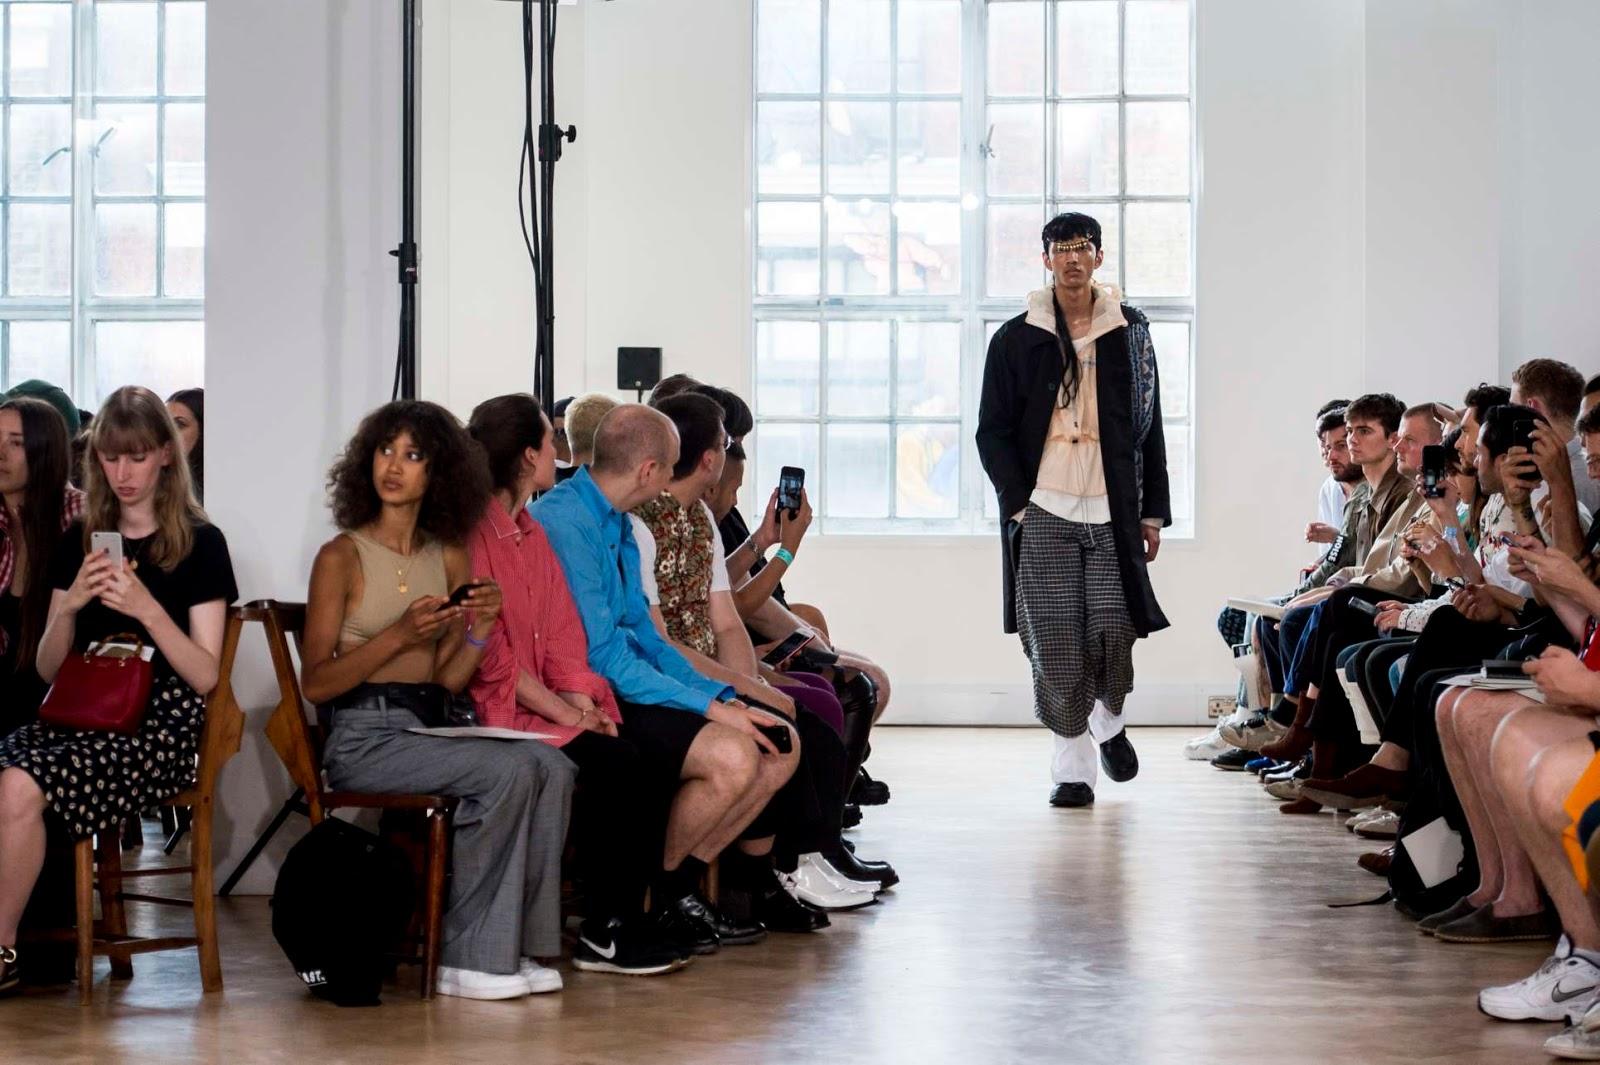 London Fashion Week - Home 1